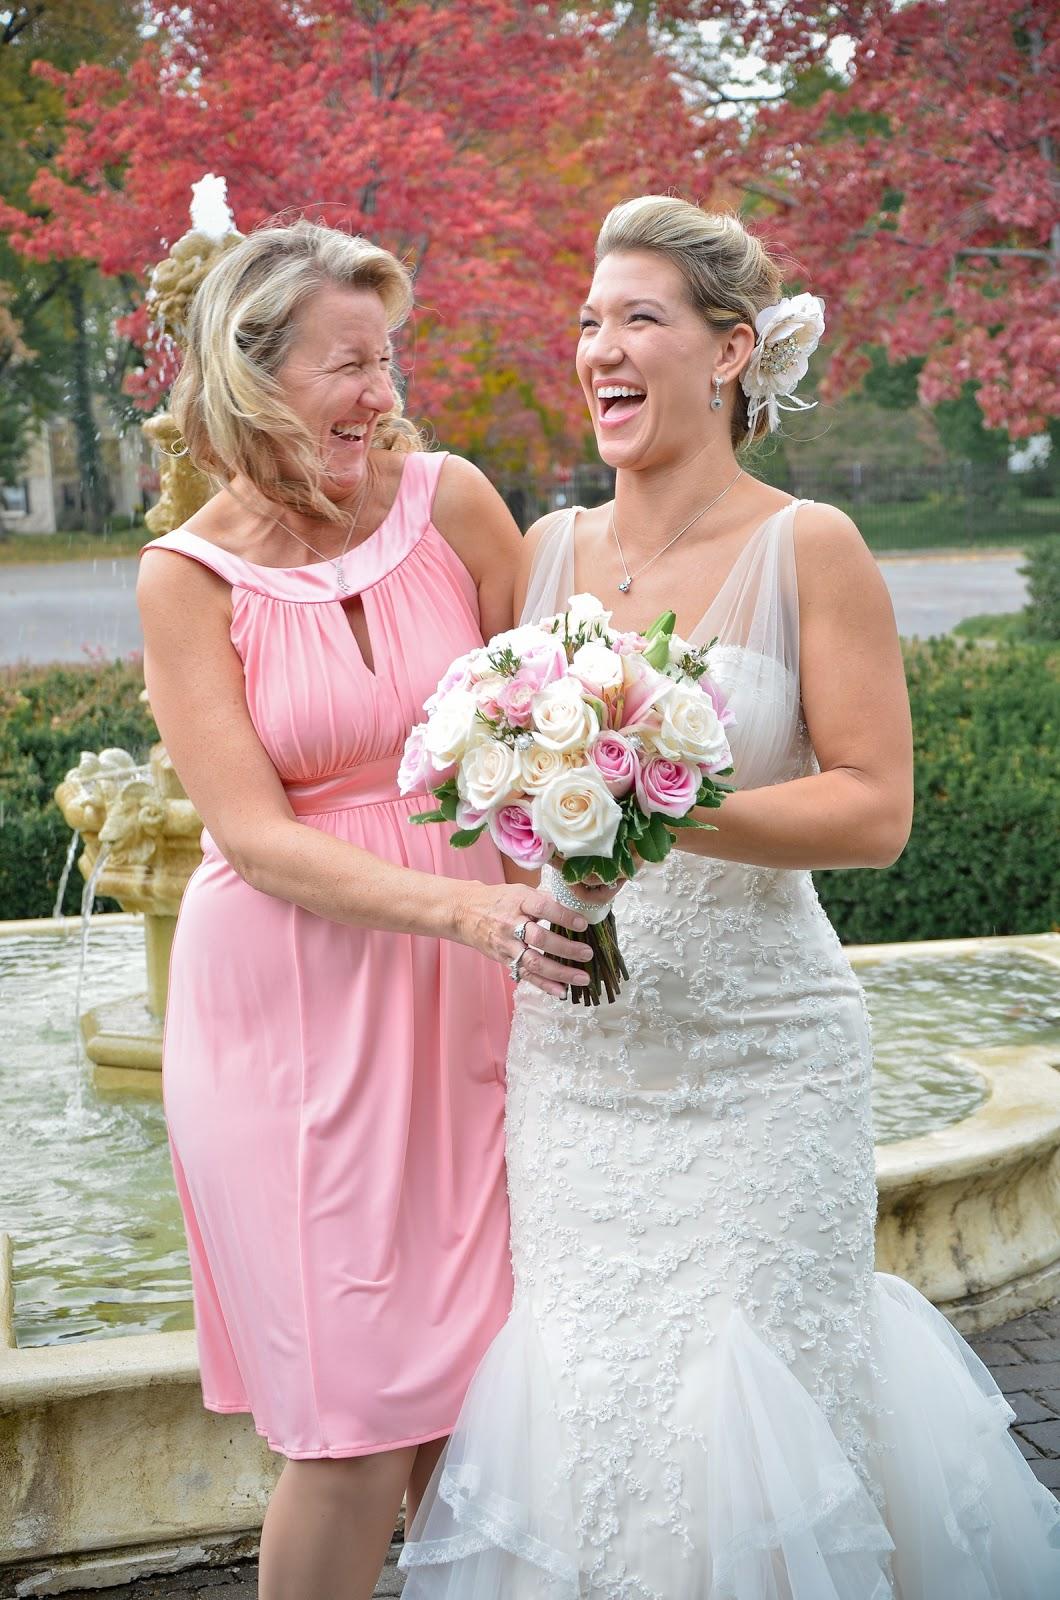 Four Leaf Photography - Louisville Wedding Photographer: October 2012